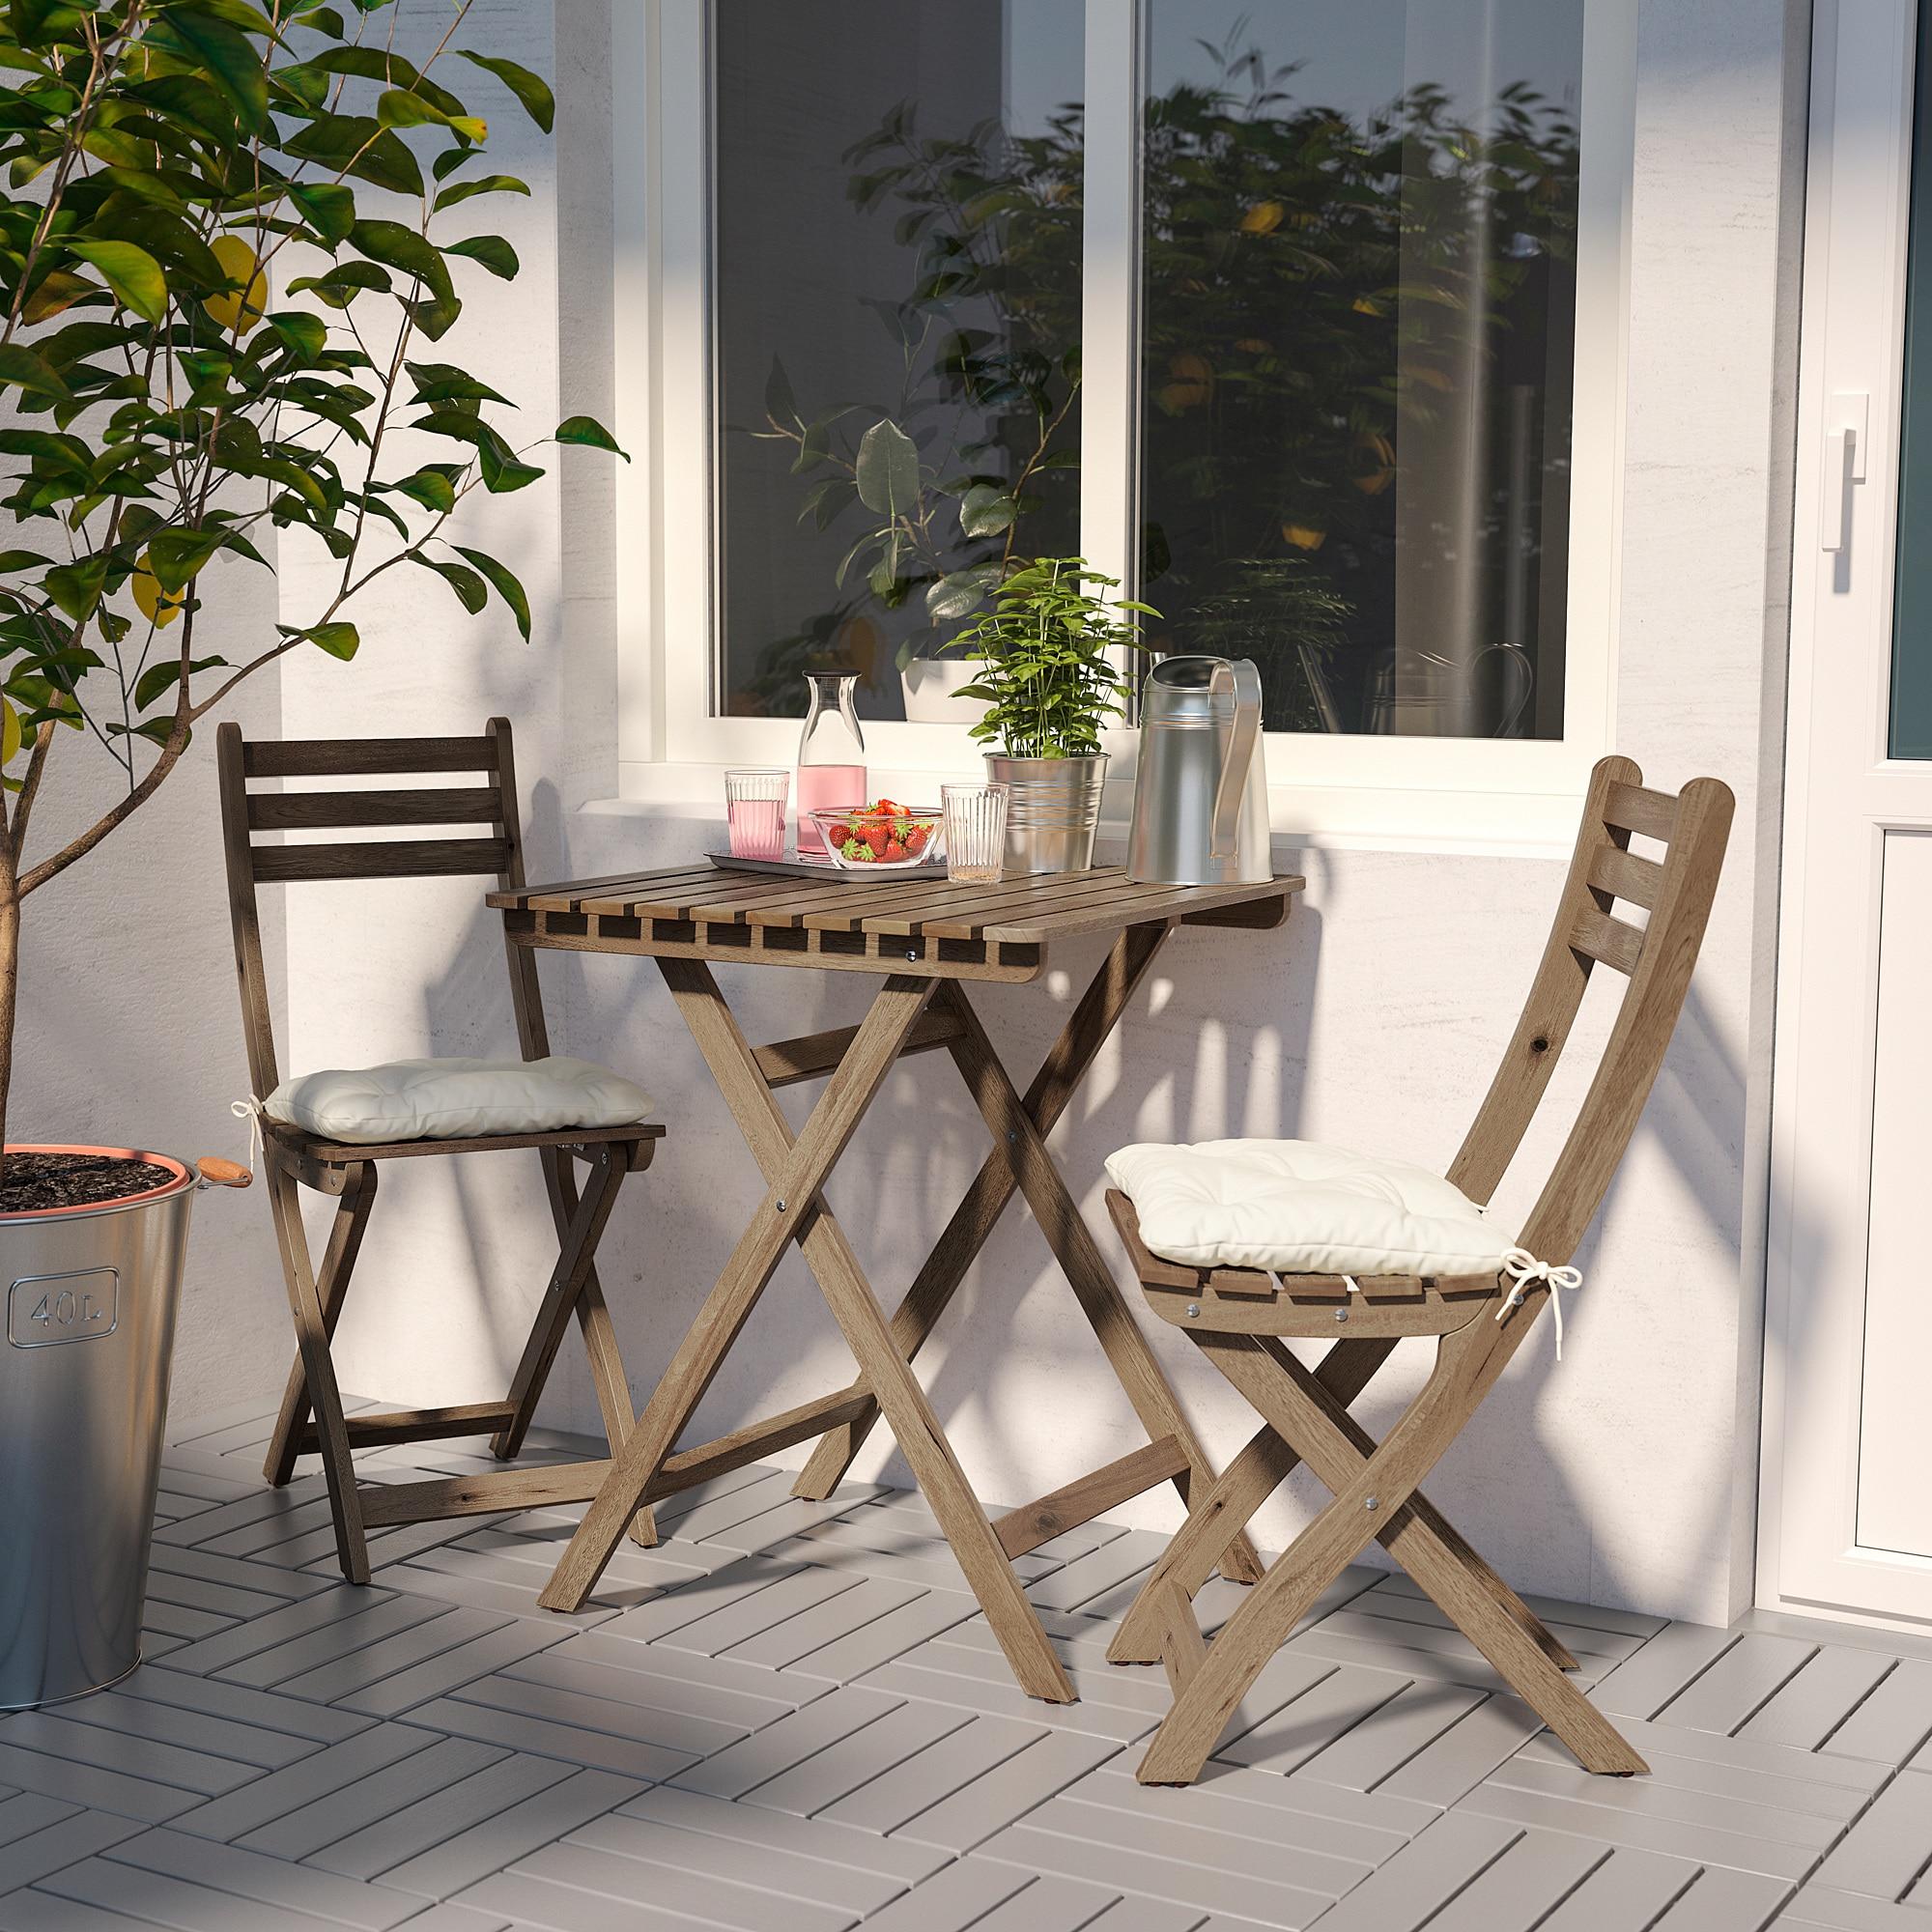 Best Discount Furniture Stores: ASKHOLMEN Bistro Set, Outdoor Gray Gray-brown